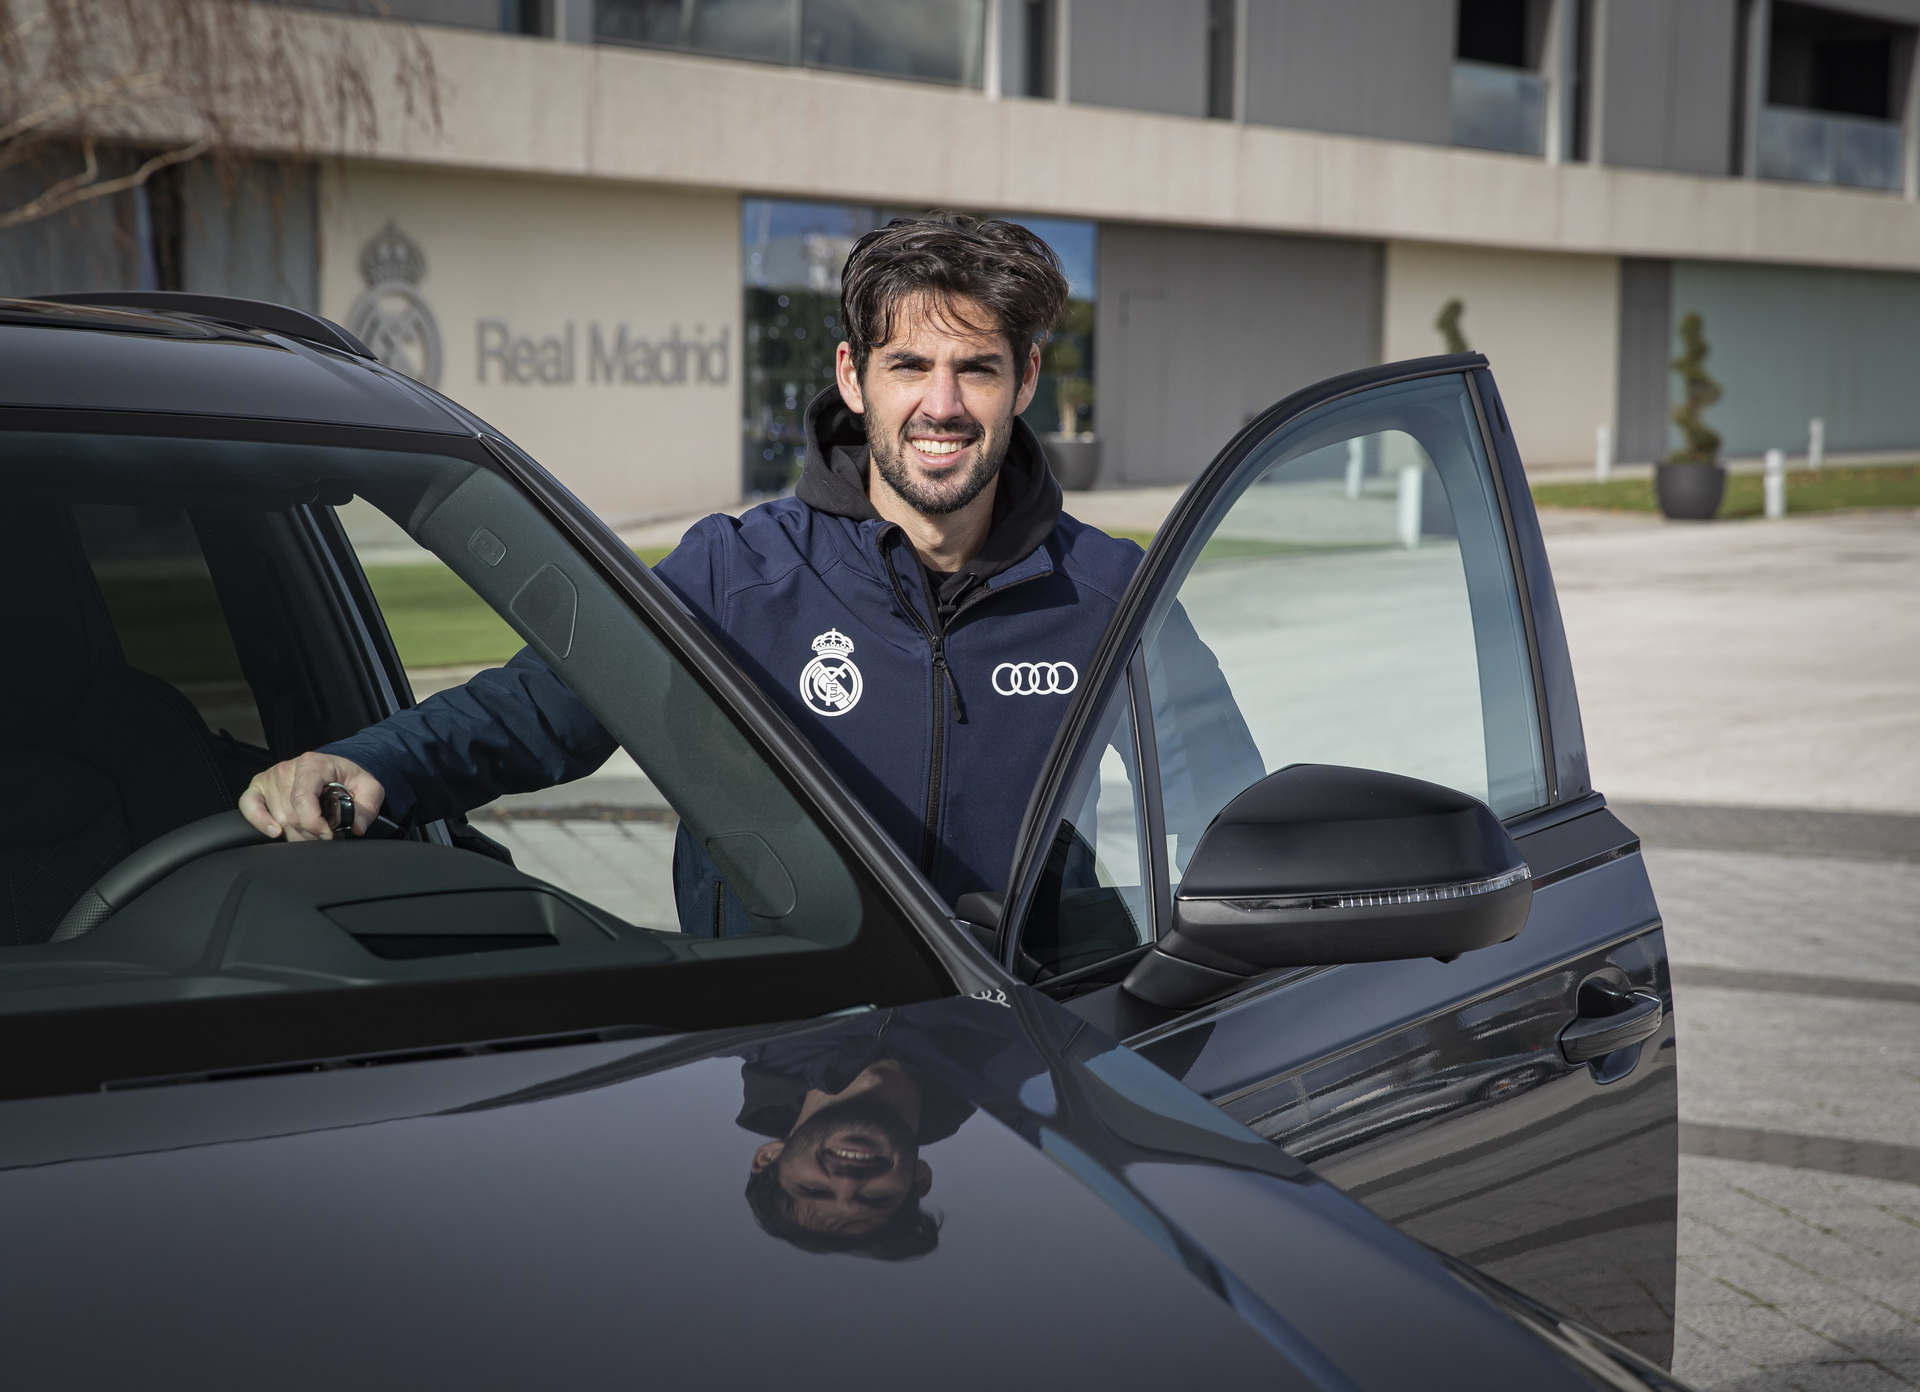 Real_Madrid_Players_Audi_0004